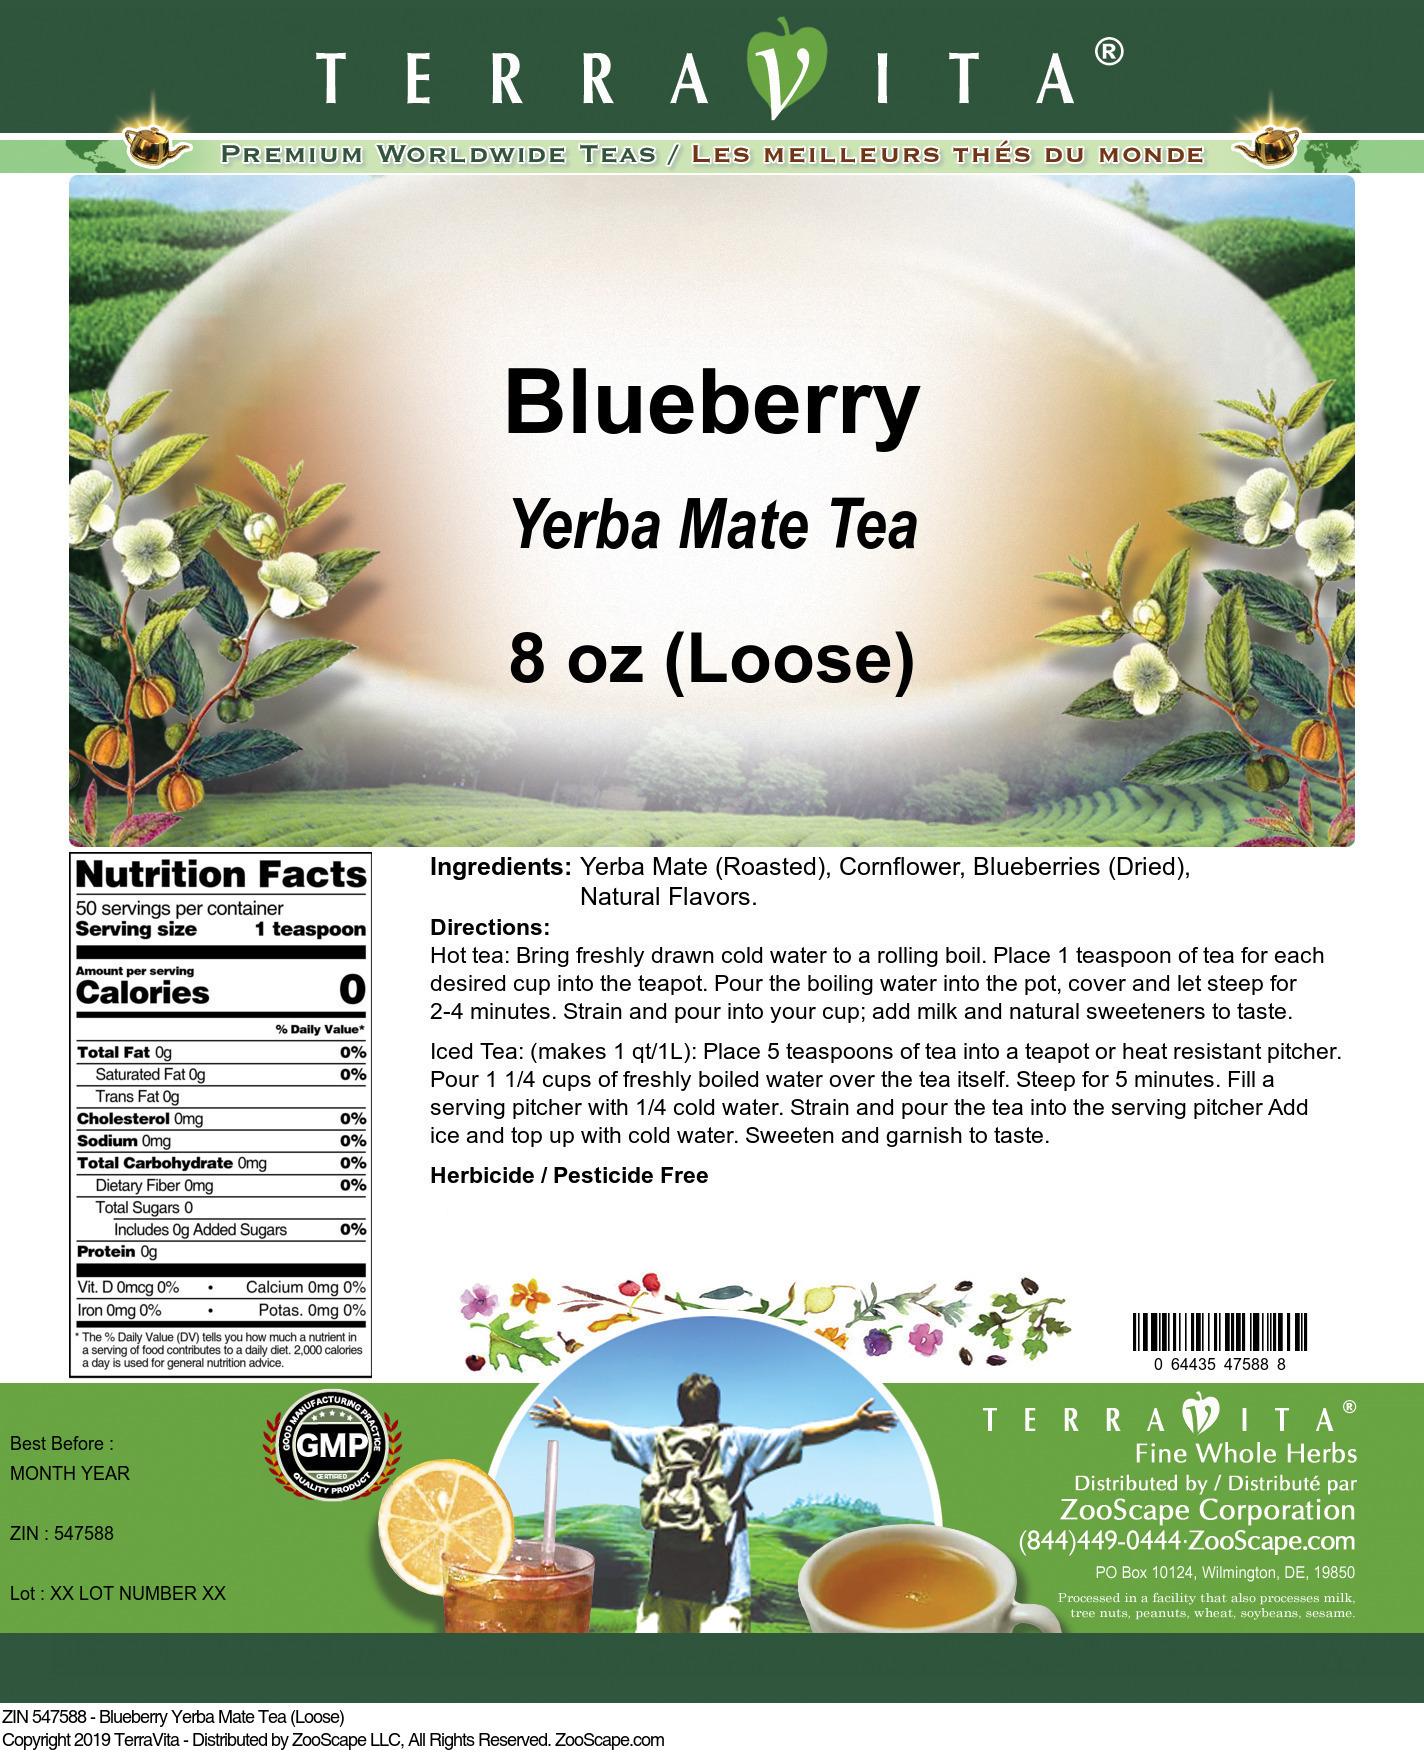 Blueberry Yerba Mate Tea (Loose)